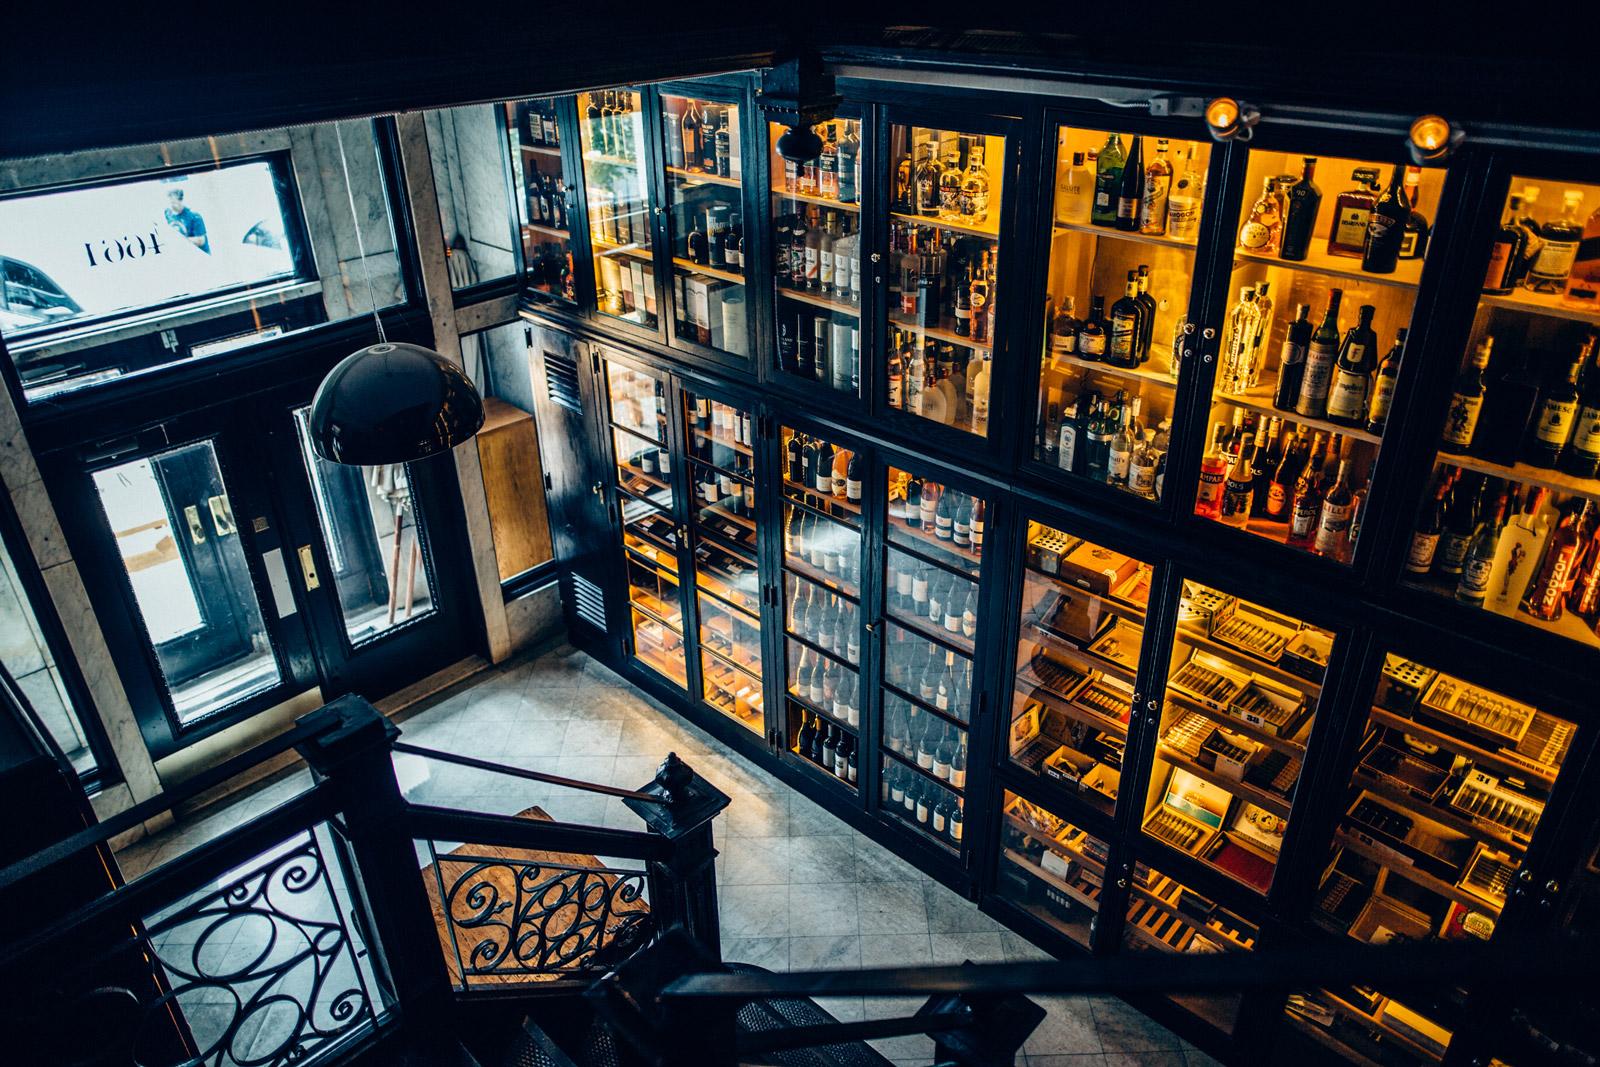 Durango-Cigar-Lounge-Saint-Louis-Tobacconist-Bottle-Shop.jpg